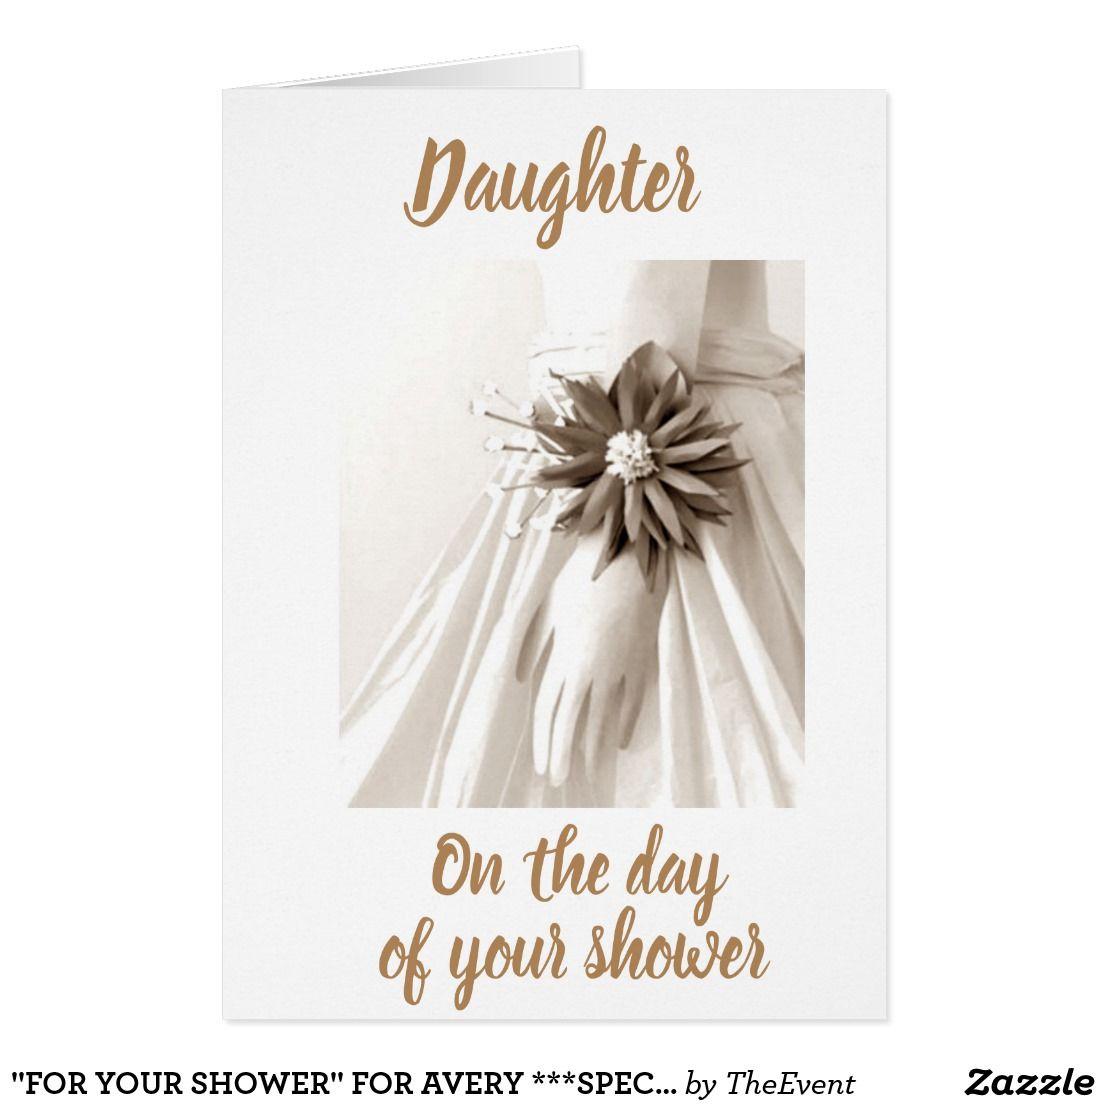 Bridal Shower Card Message For Daughter References